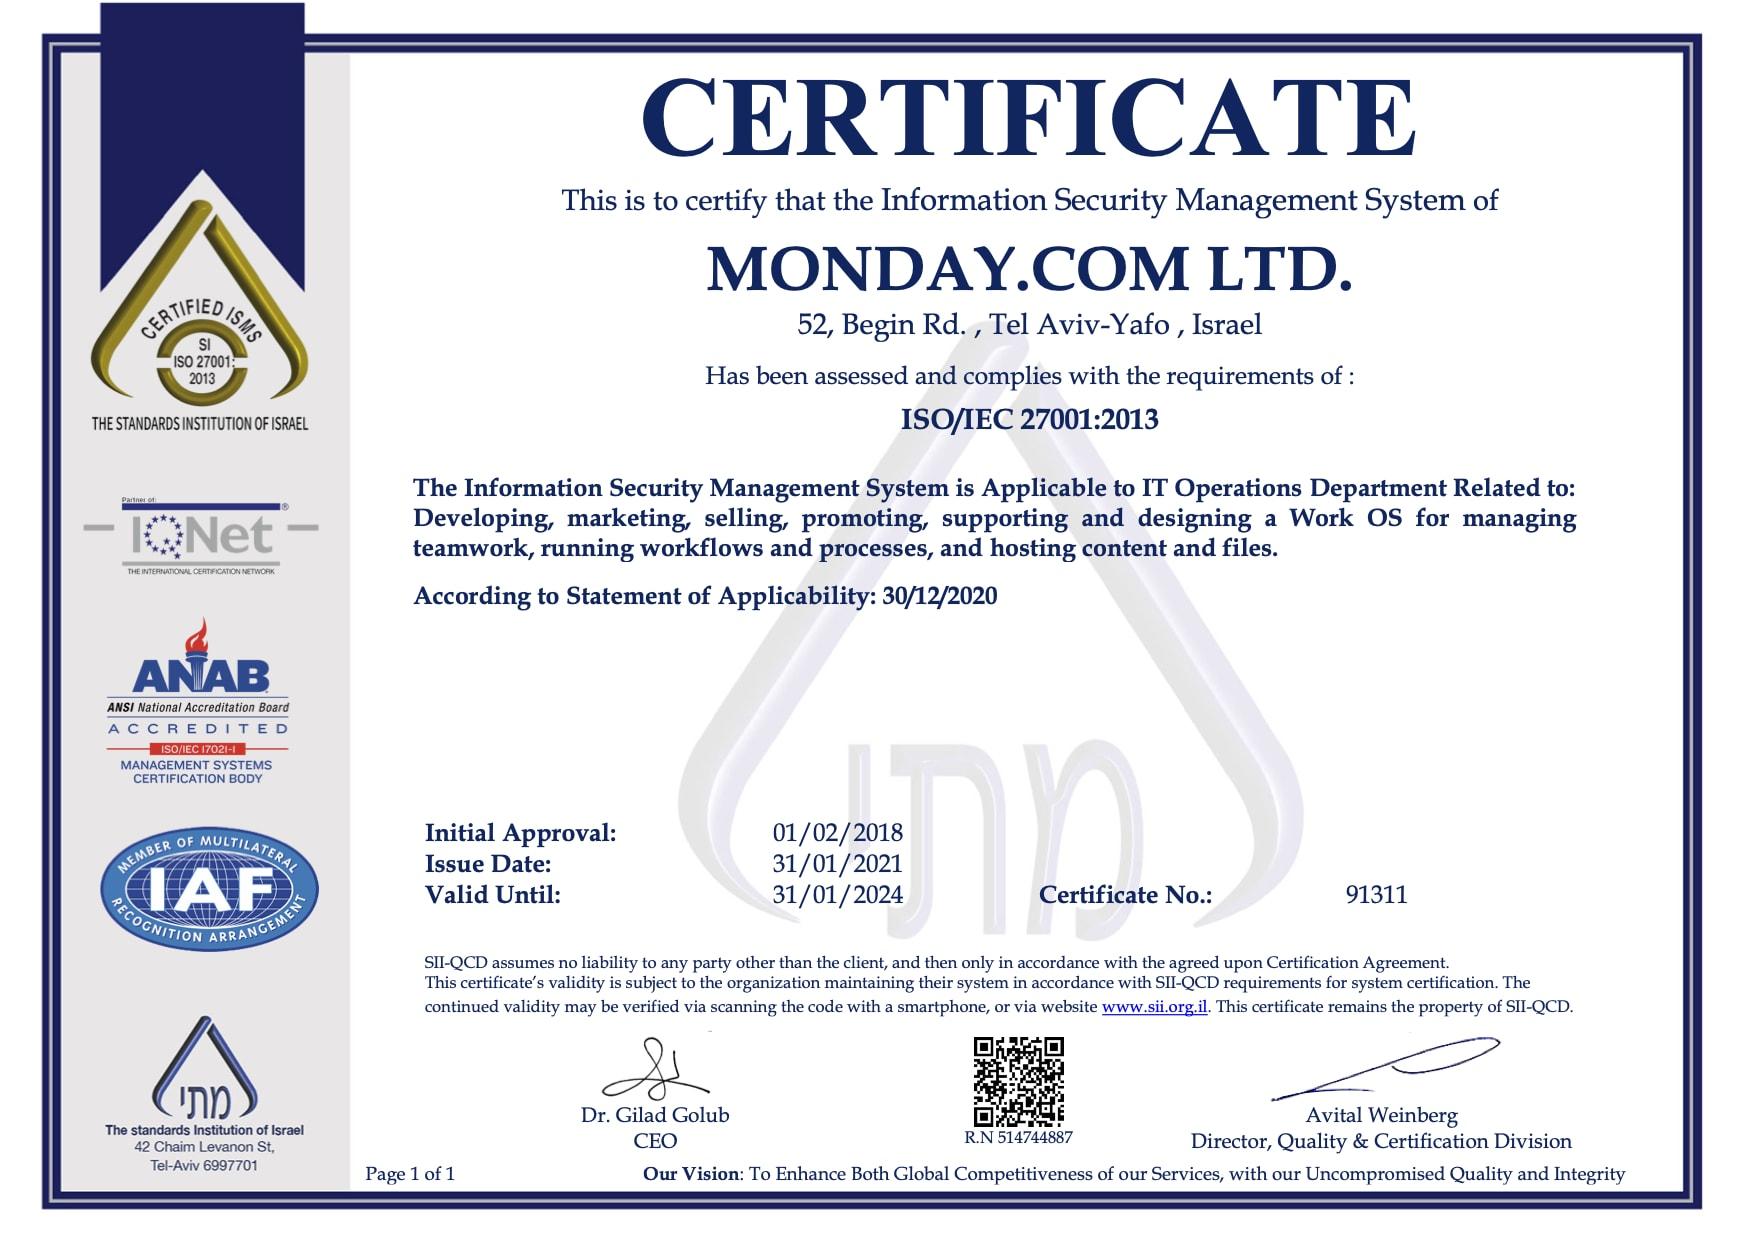 MONDAY.COM LTD 27001